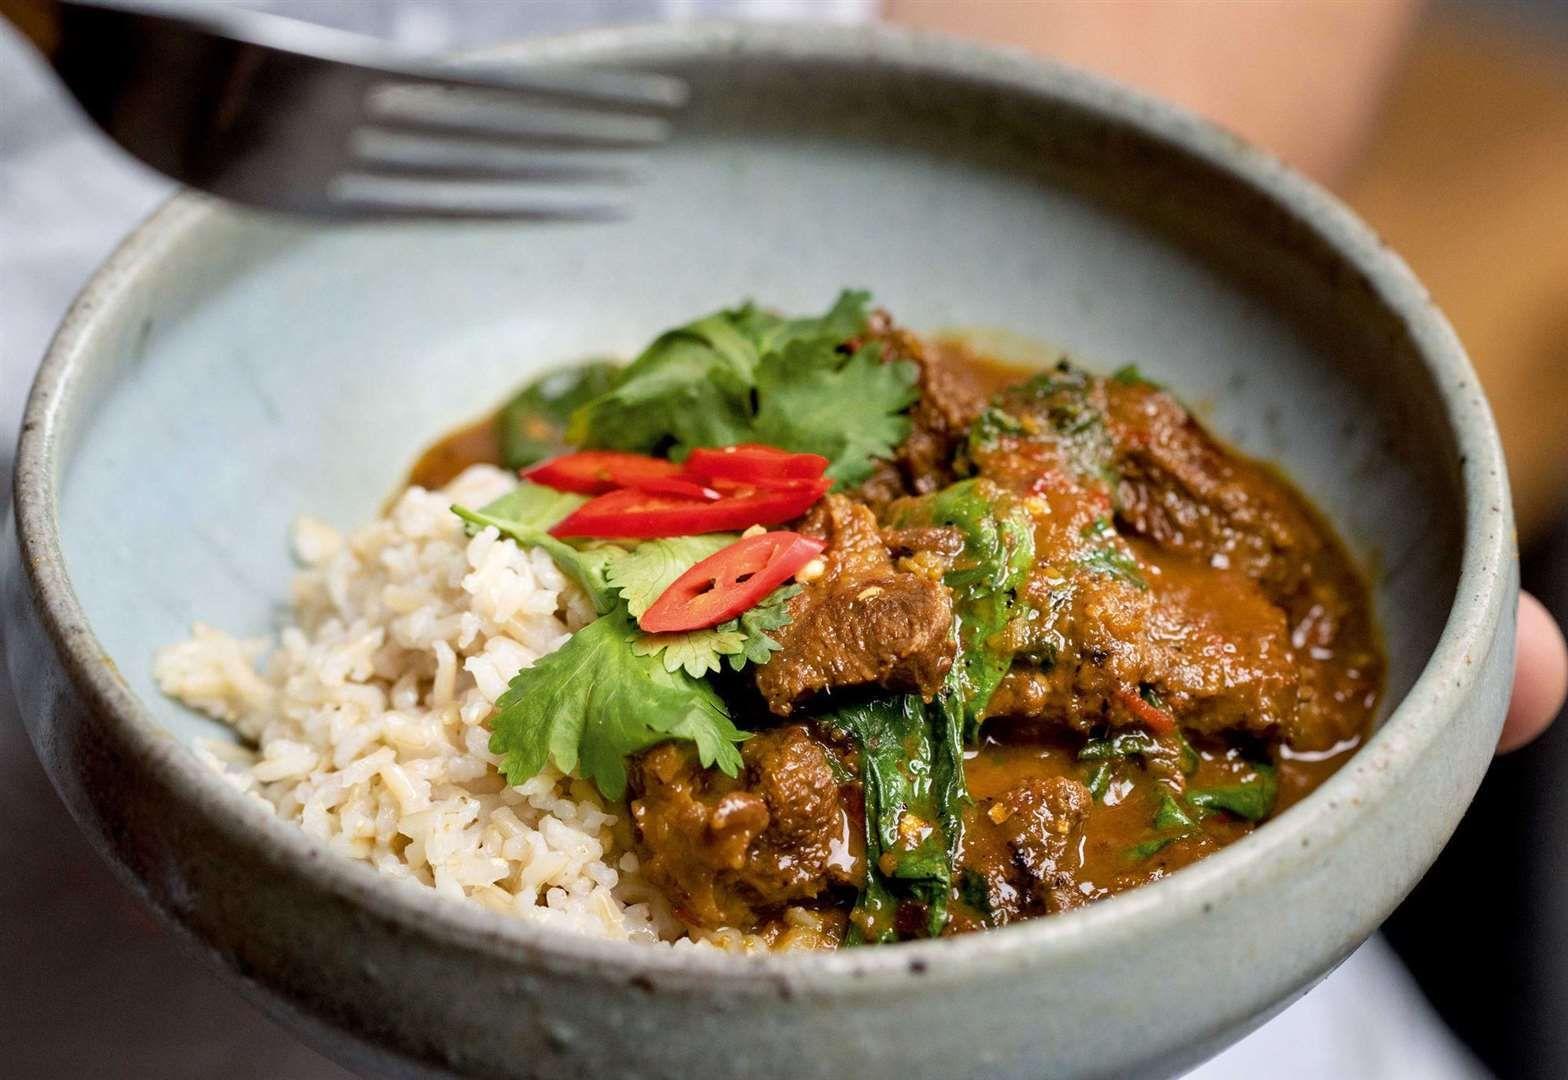 Recipe of the week Tom Kerridge's Malaysianstyle beef